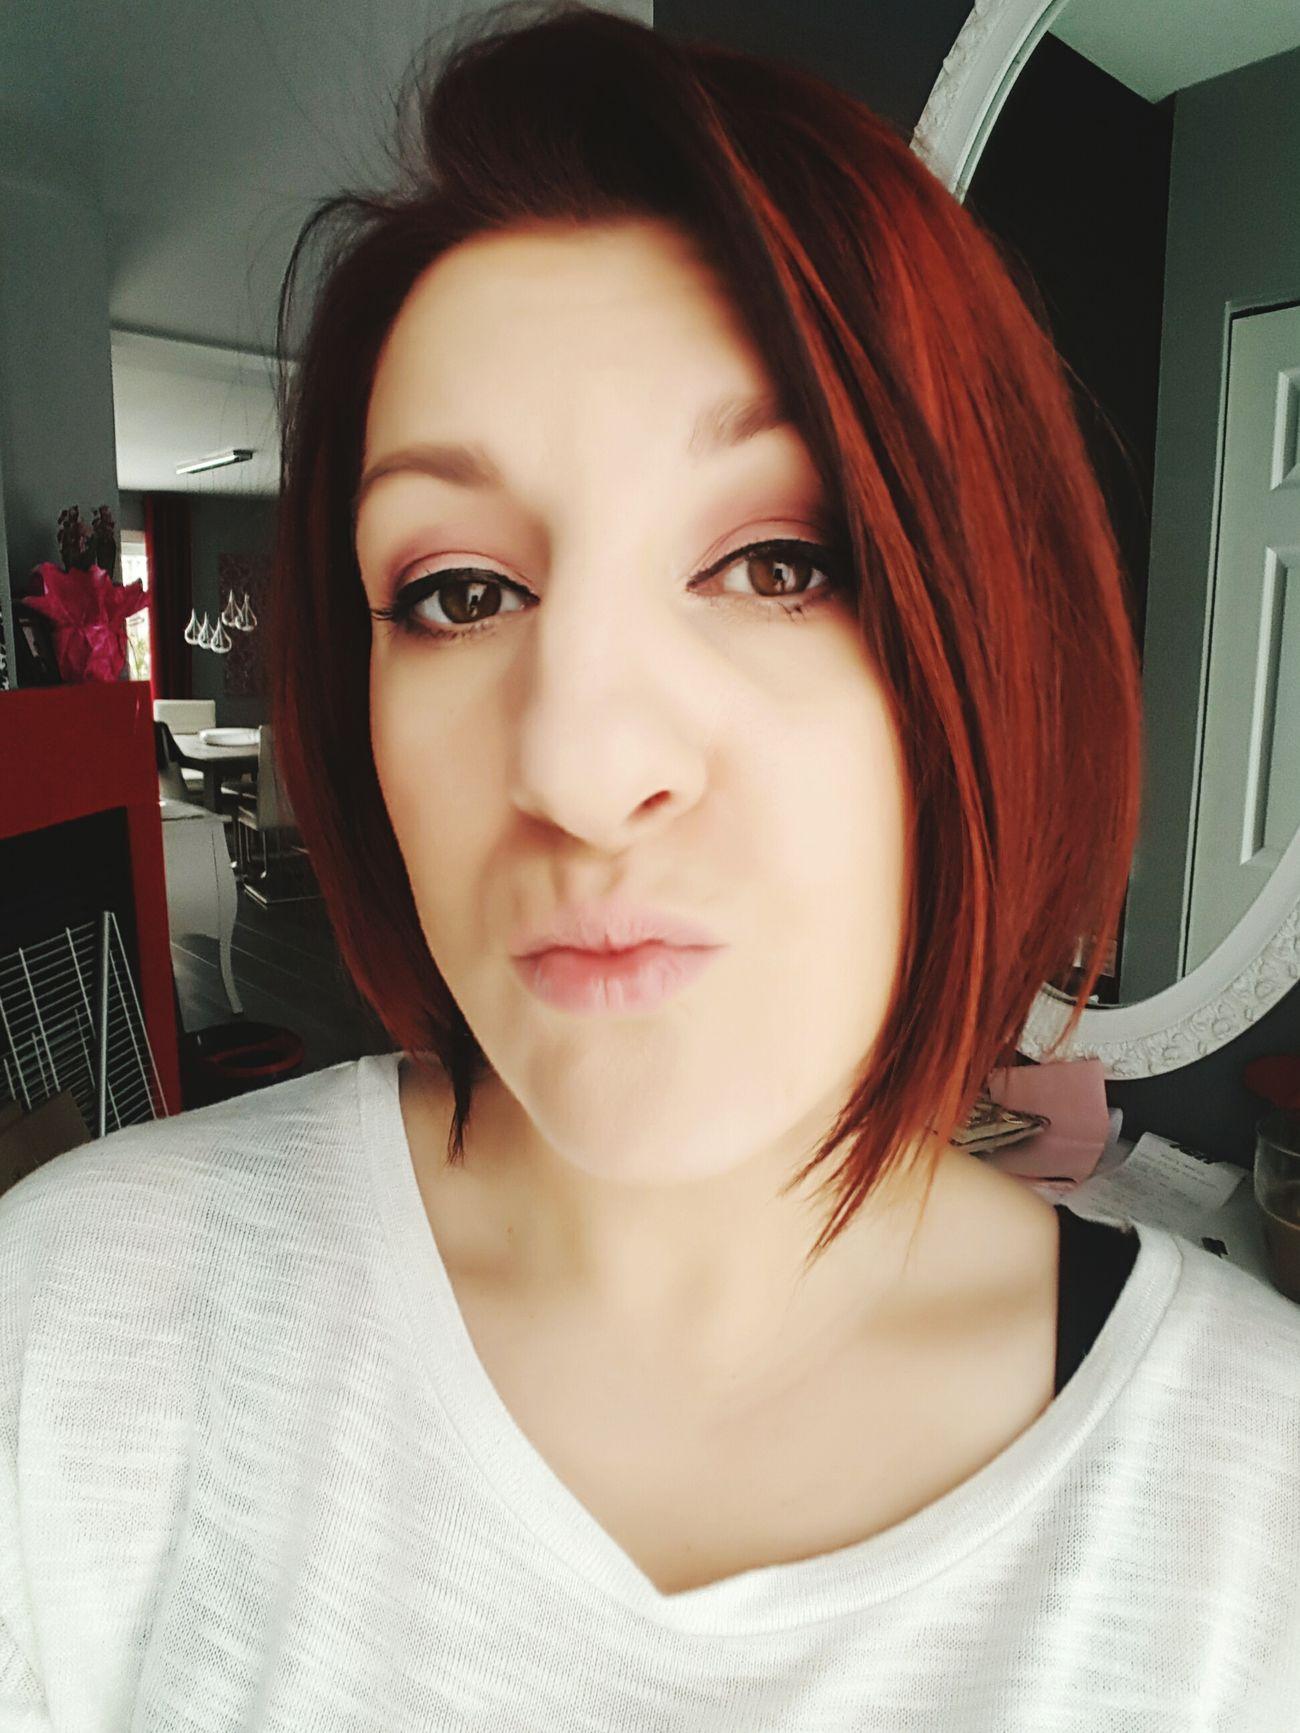 New Haircut New Hair Color :) Auburn Hair Selfie ✌ Love The Colors Makeup